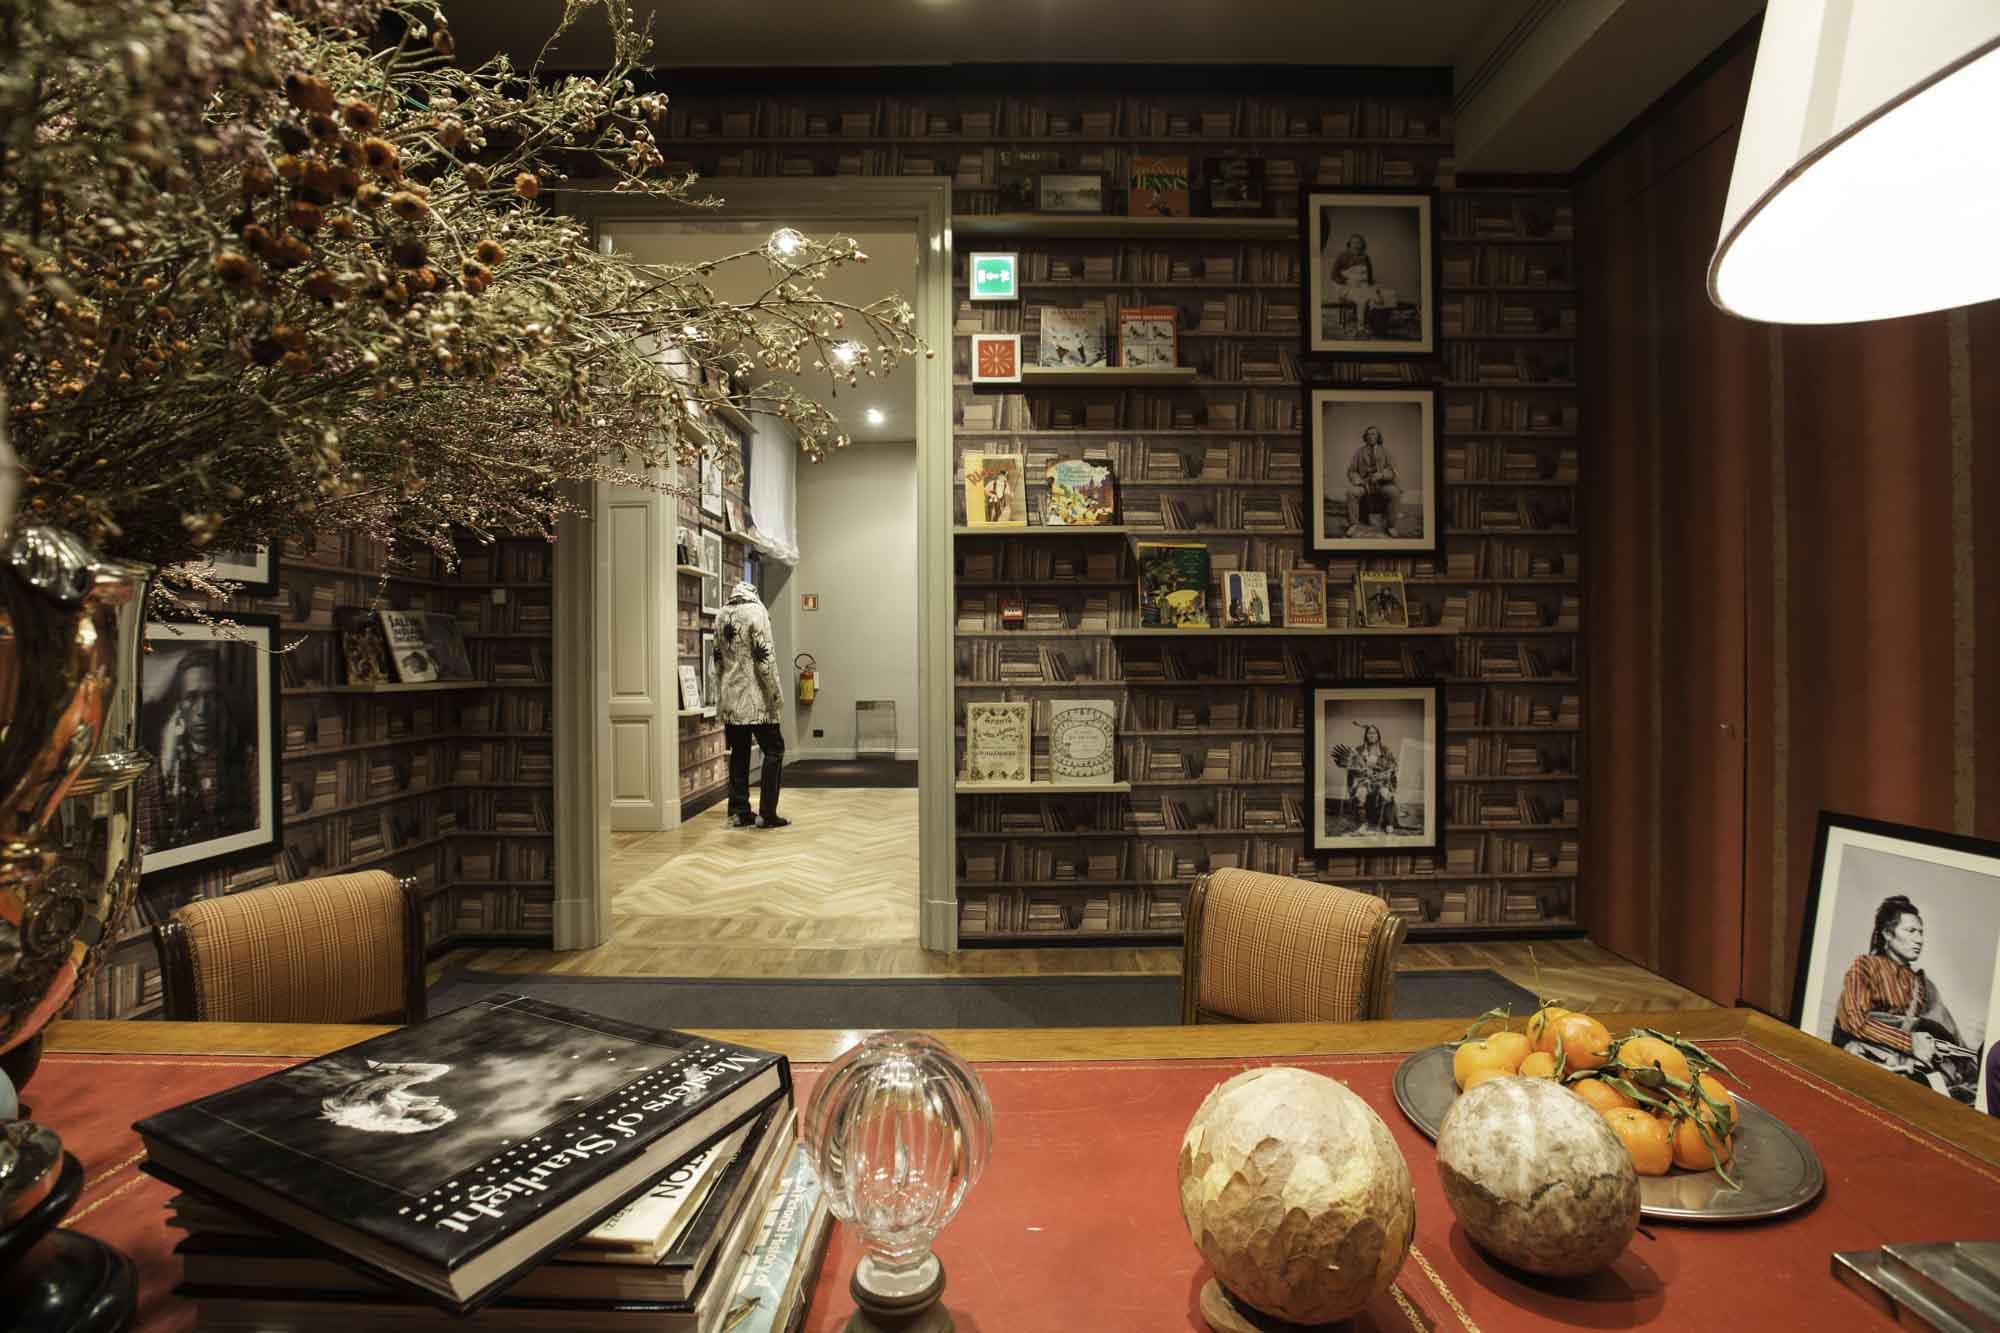 Uanof studio studio fotografico milano architettettura for Etro arredamento